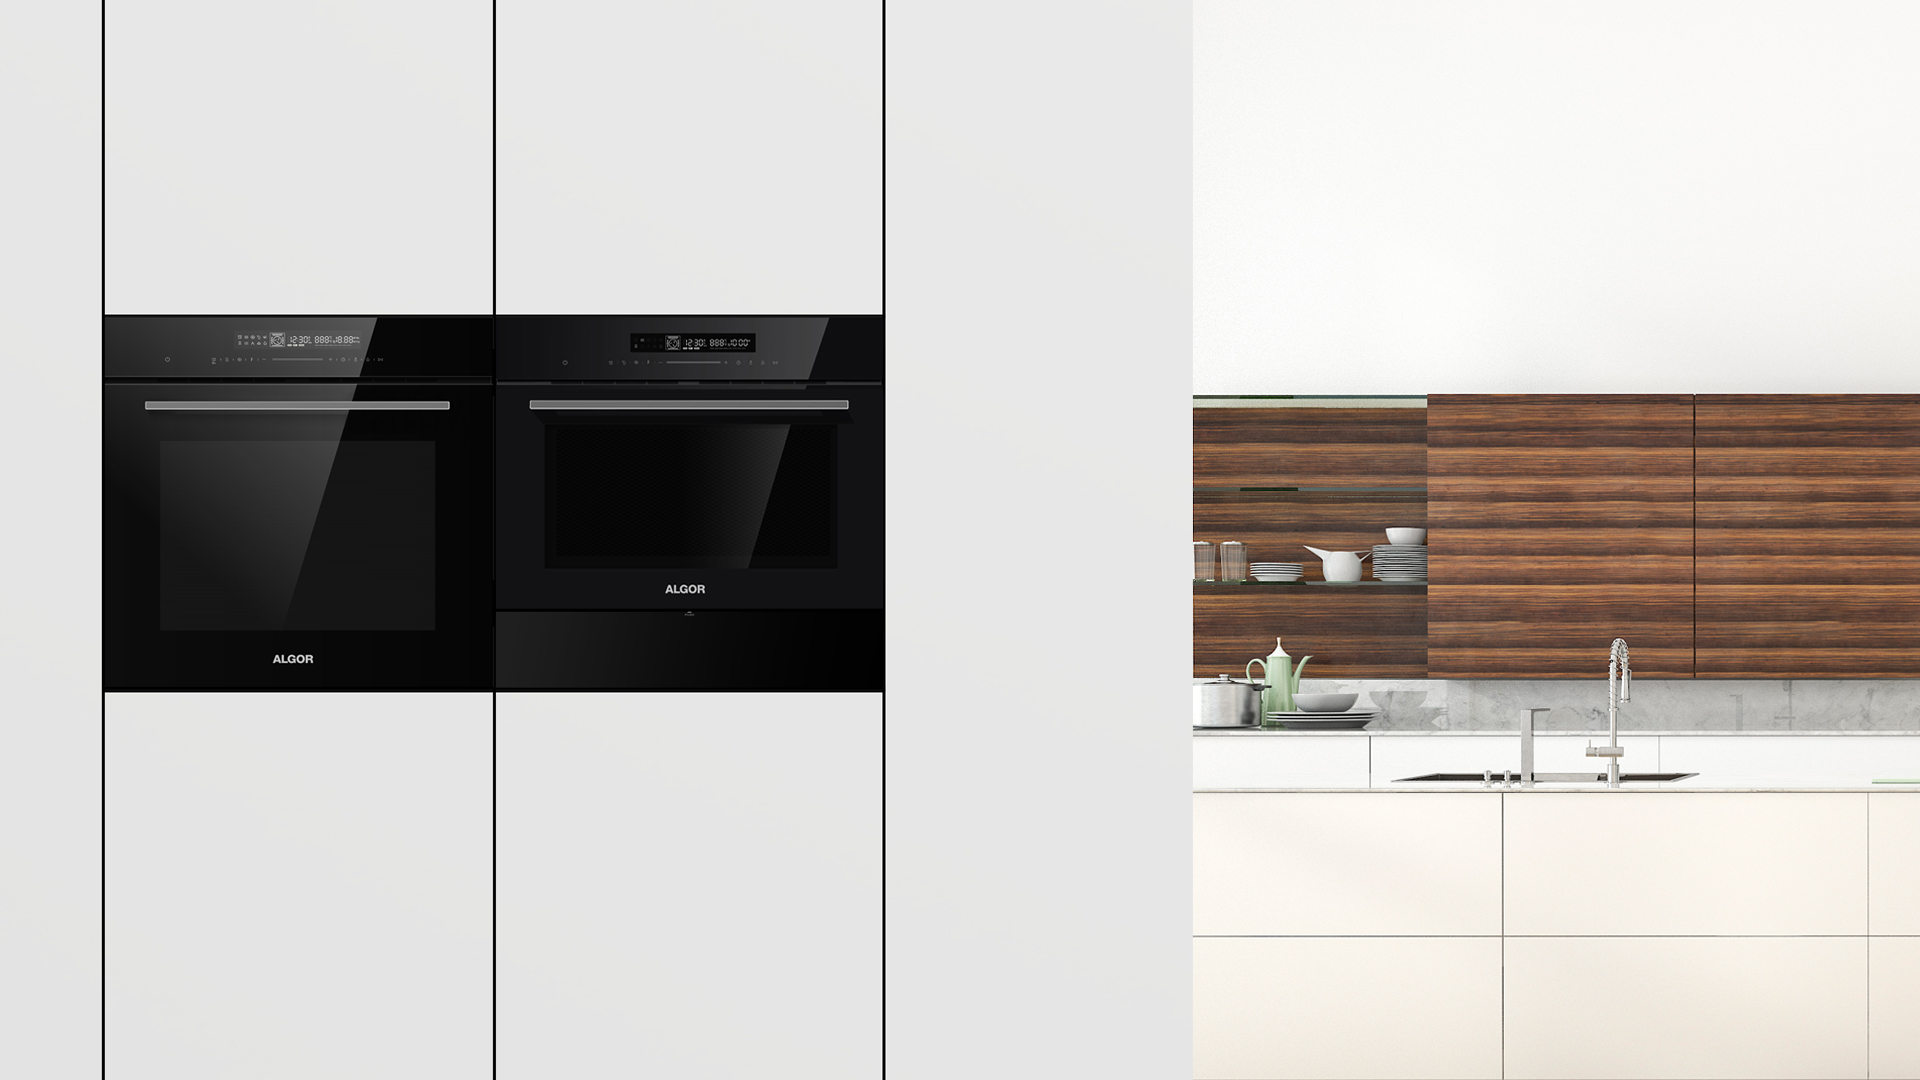 Black Oven